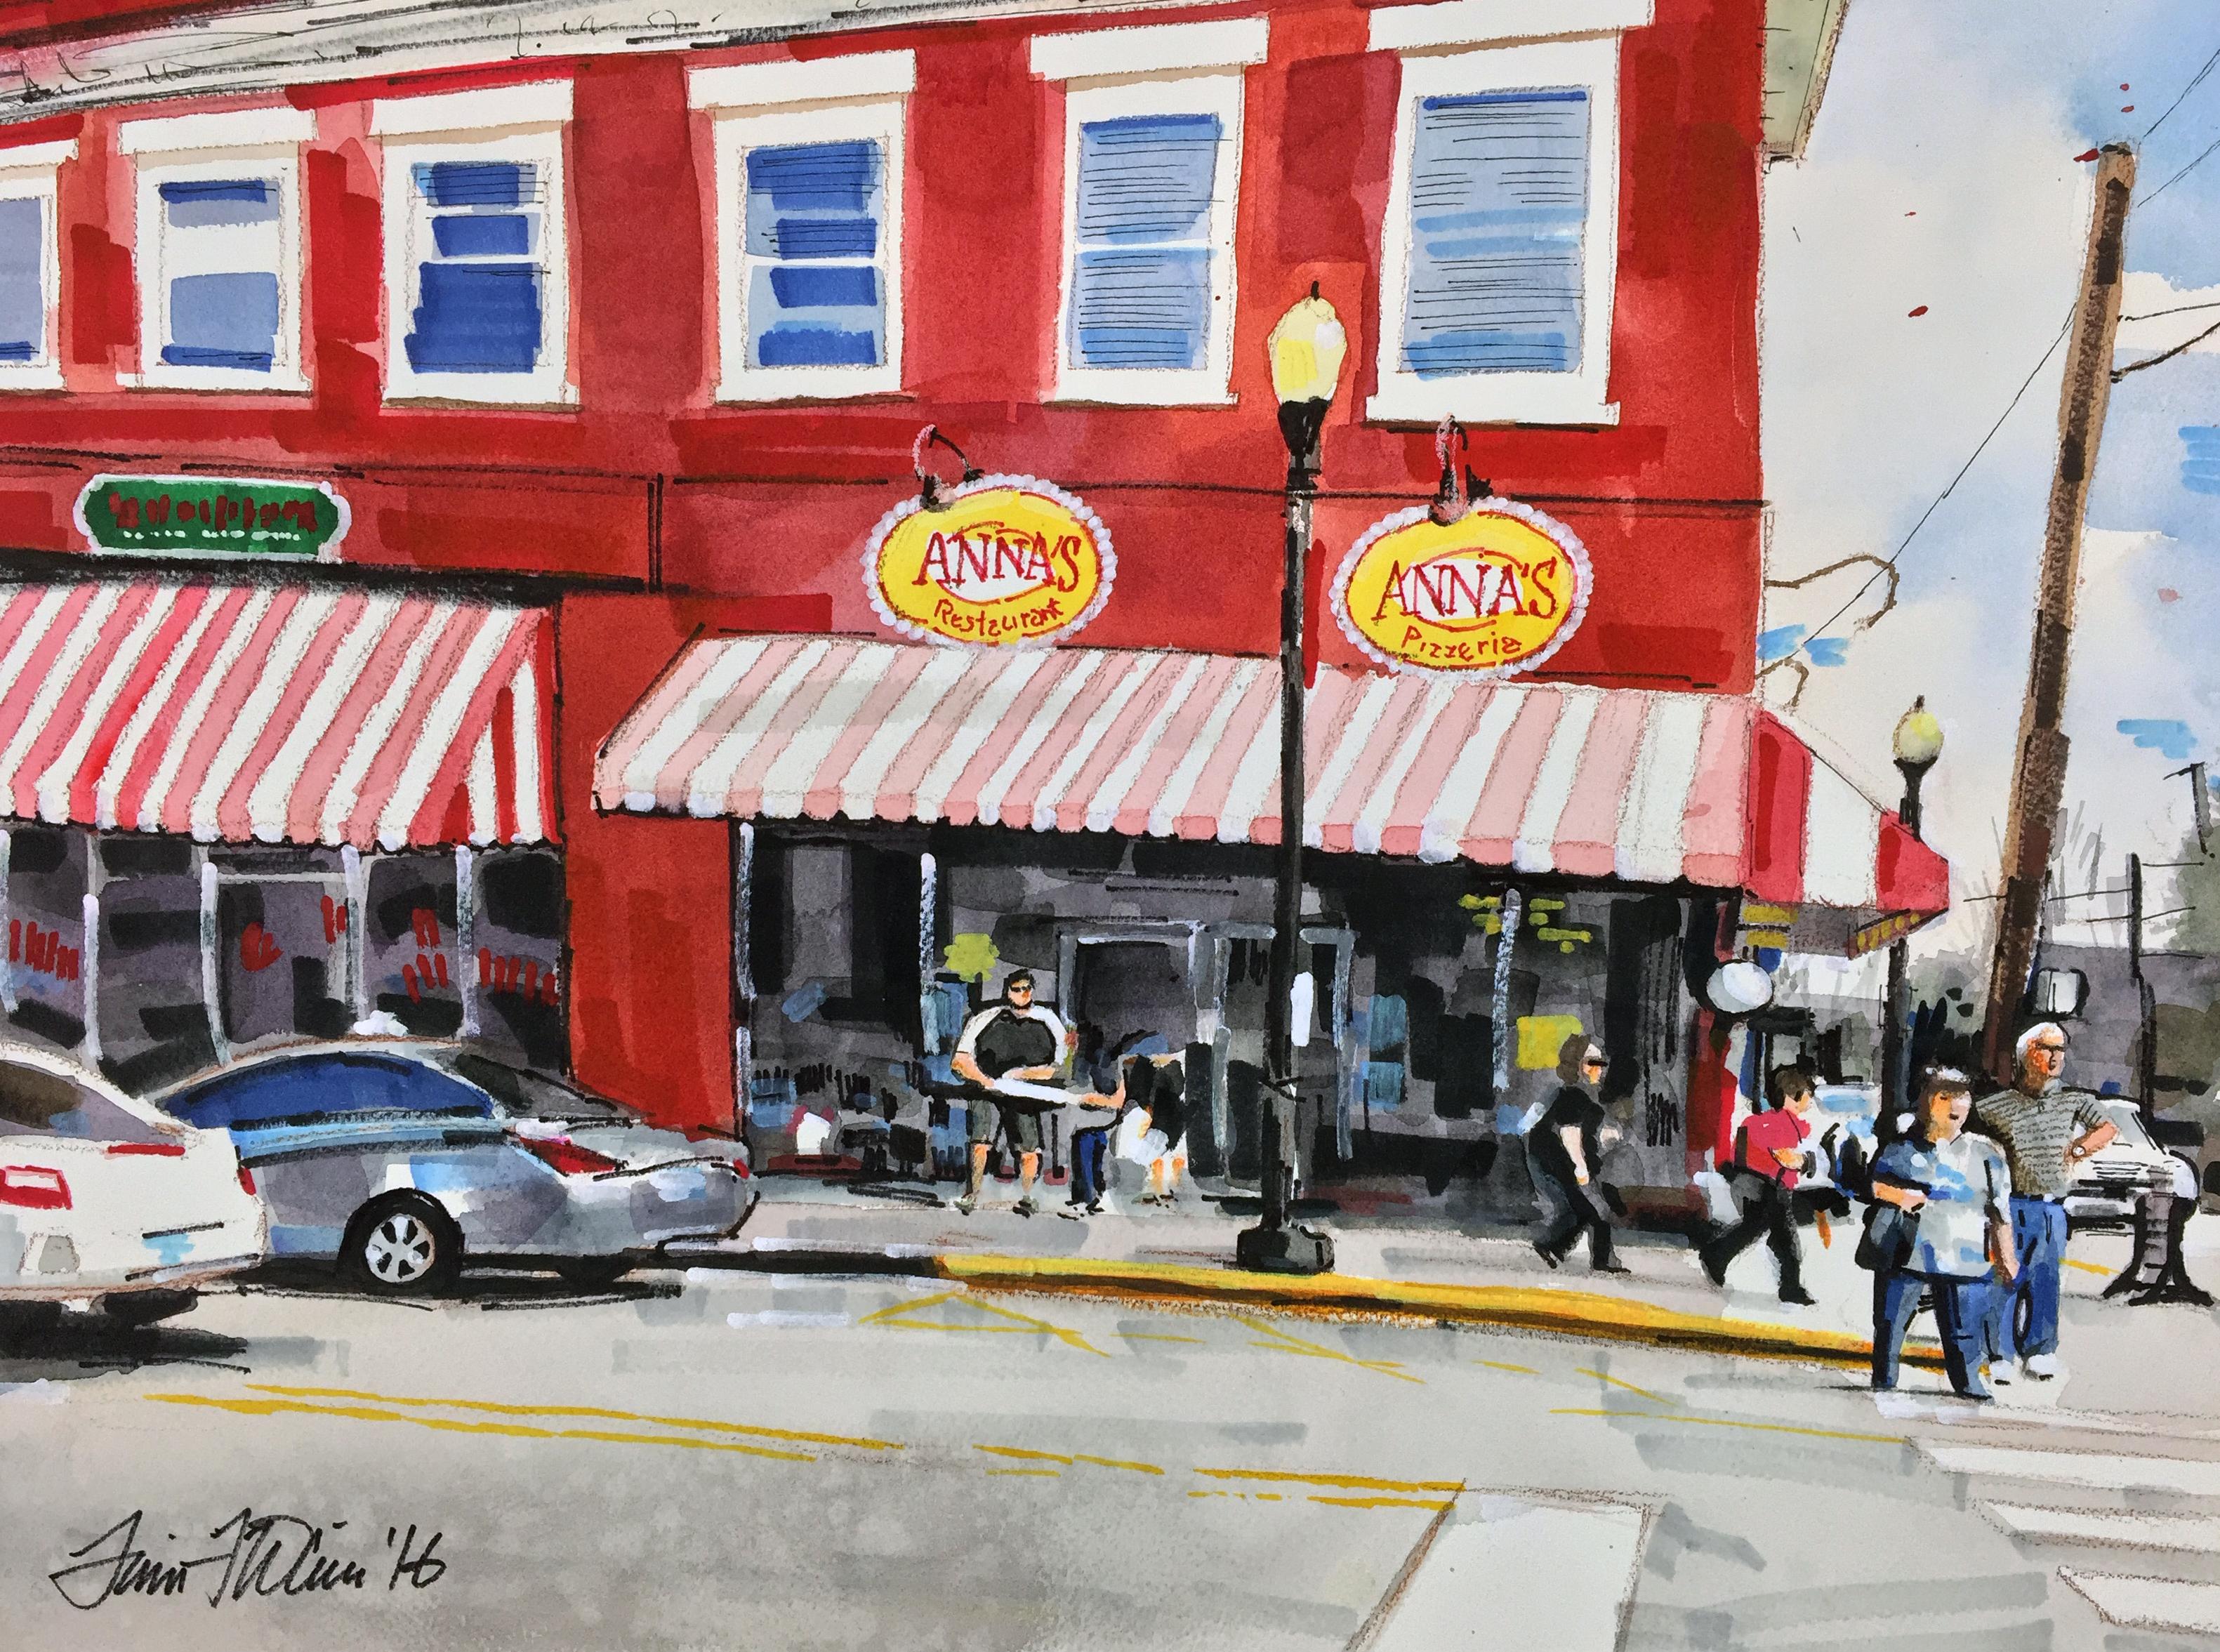 Anna's Pizzeria - Apex, NC